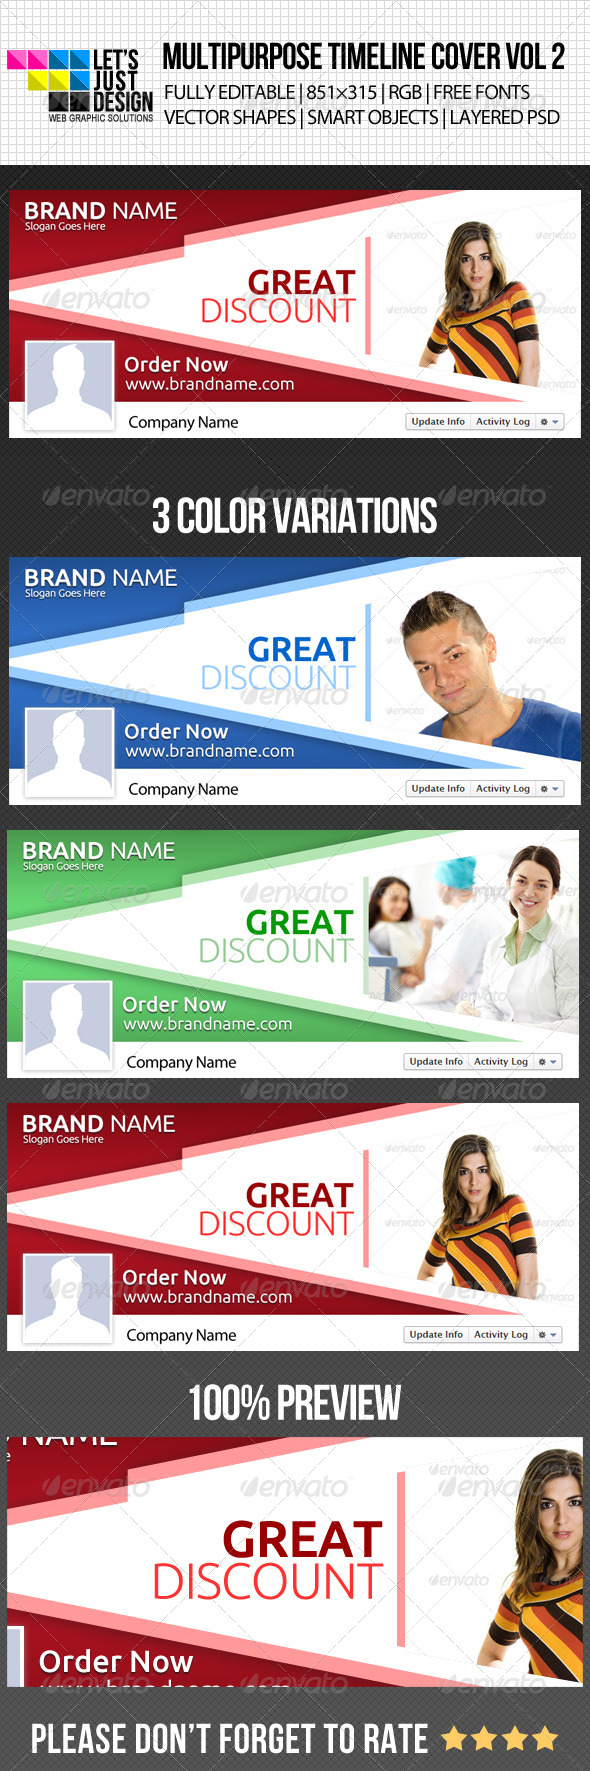 GraphicRiver Multipurpose Facebook Timeline Cover Vol 2 5021467